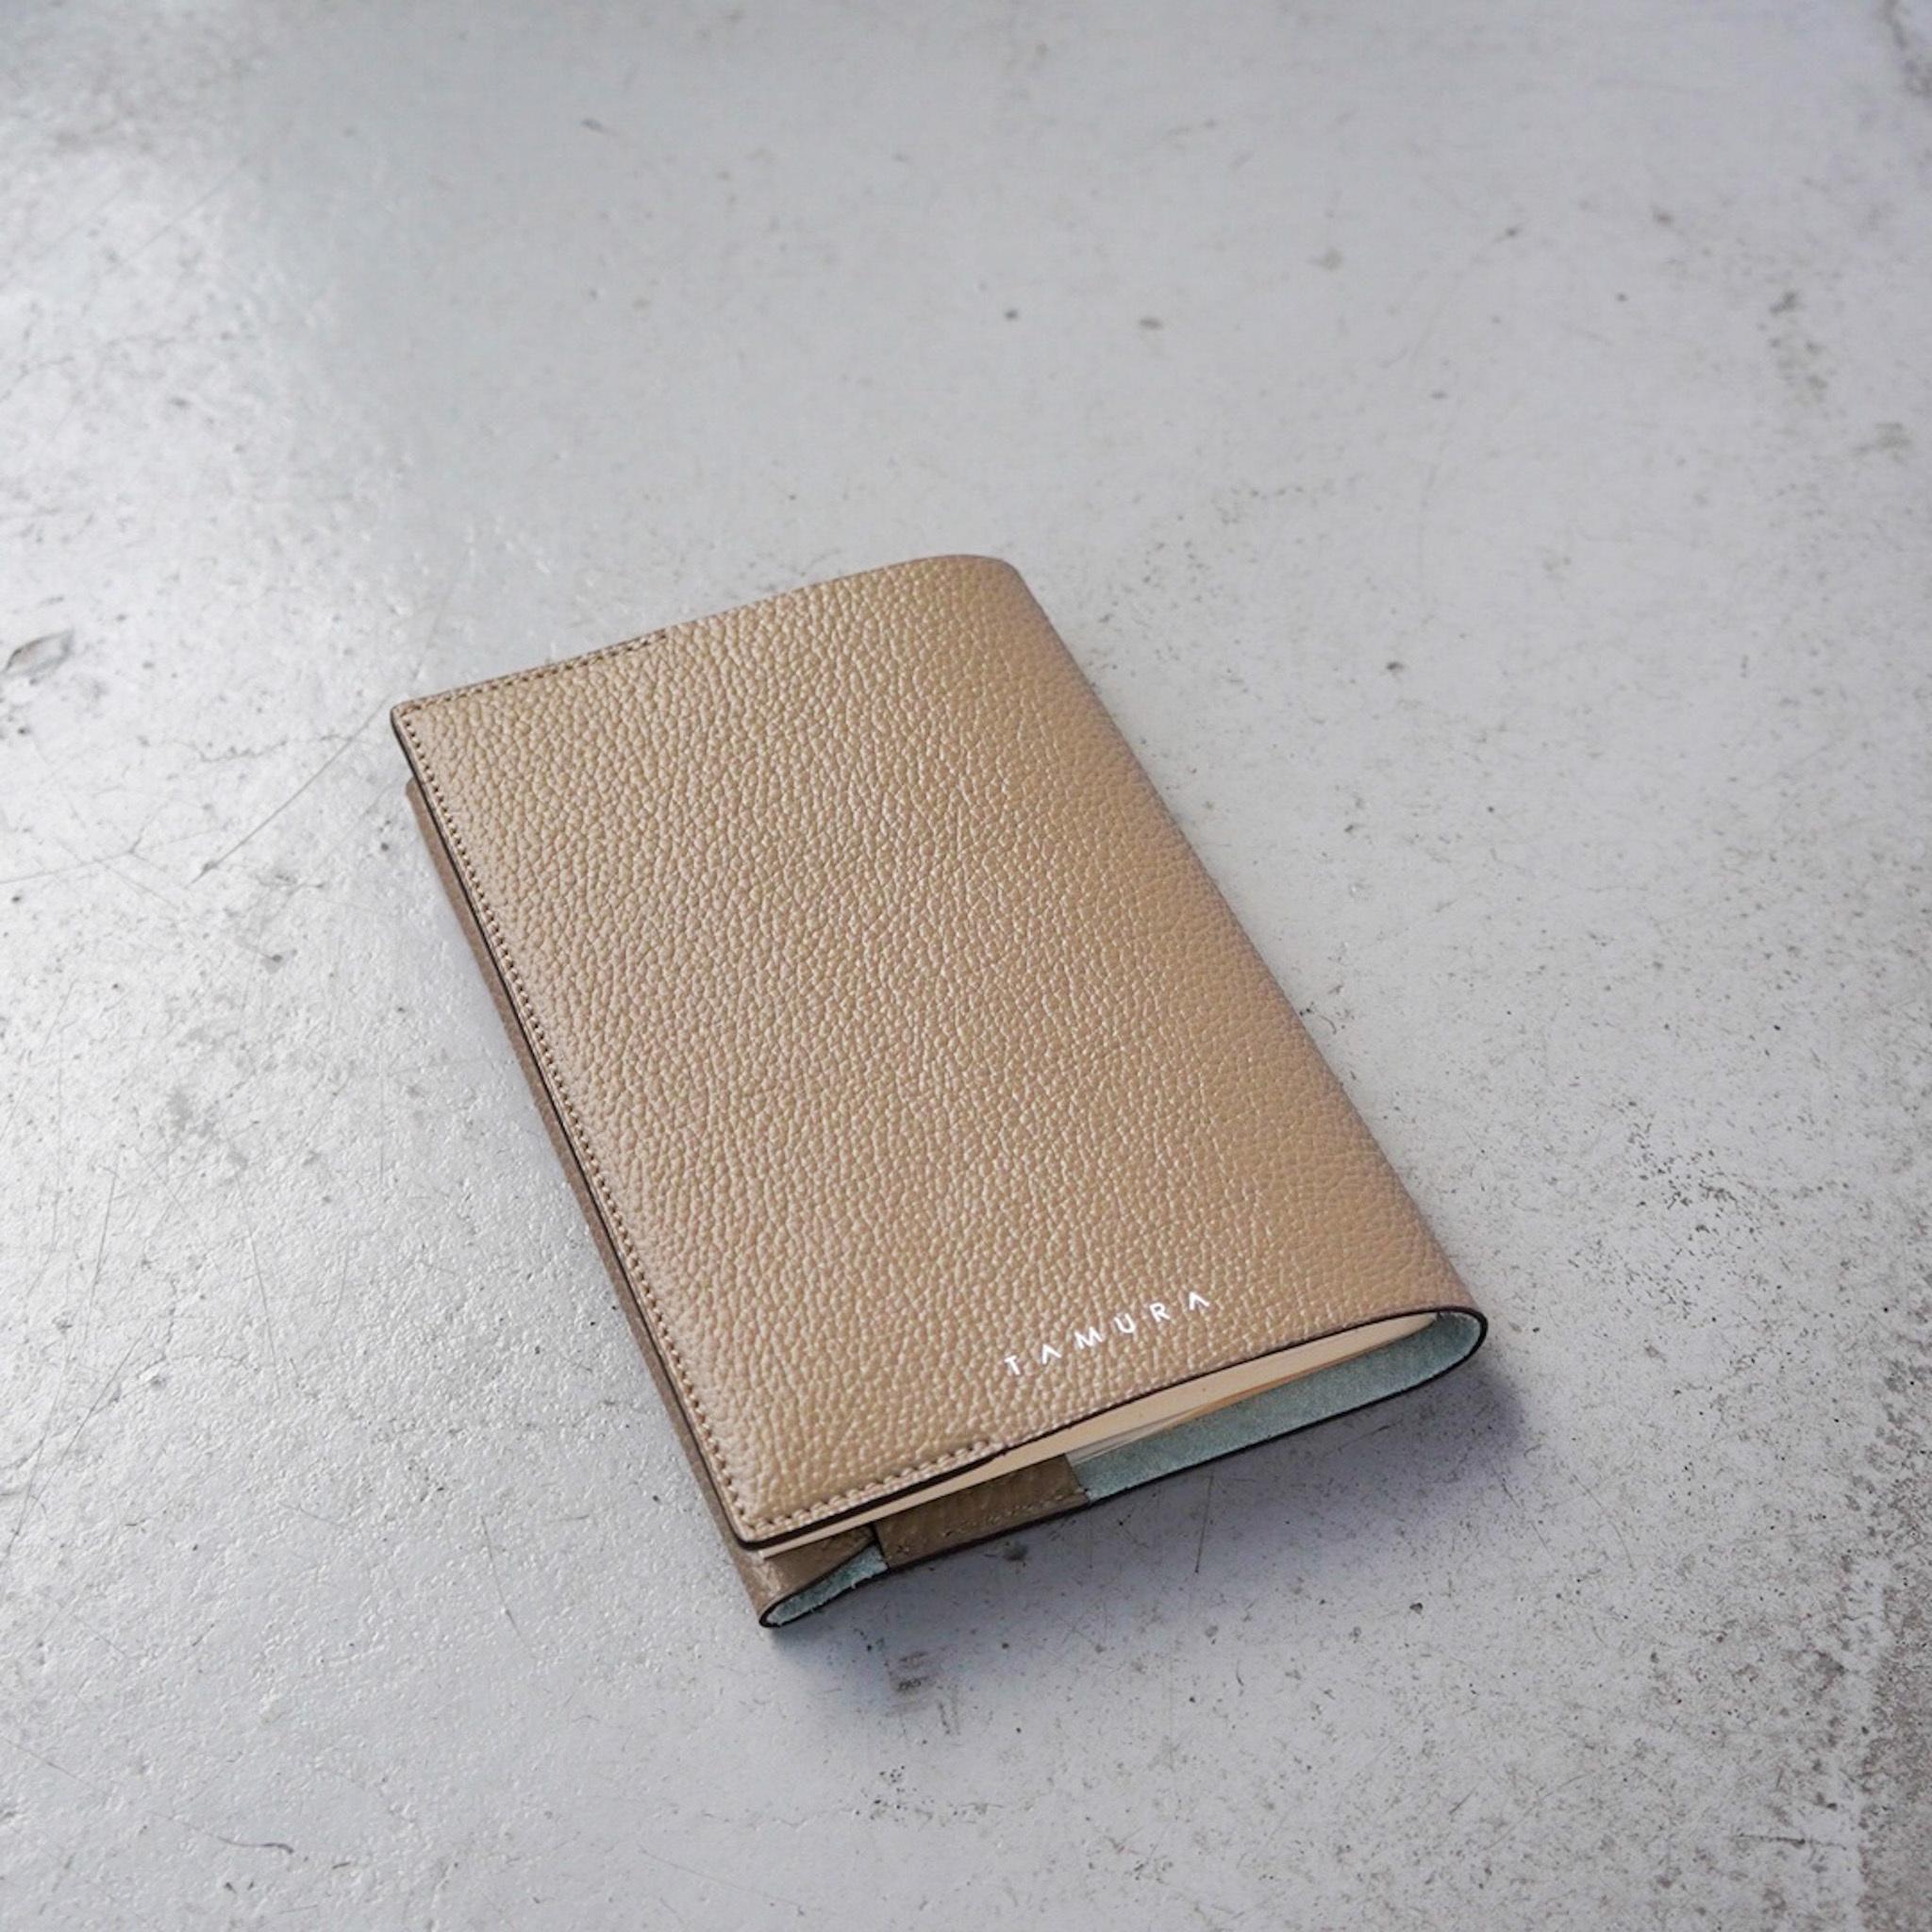 BOOK COVER(文庫サイズ)グレージュ × パステルグリーン